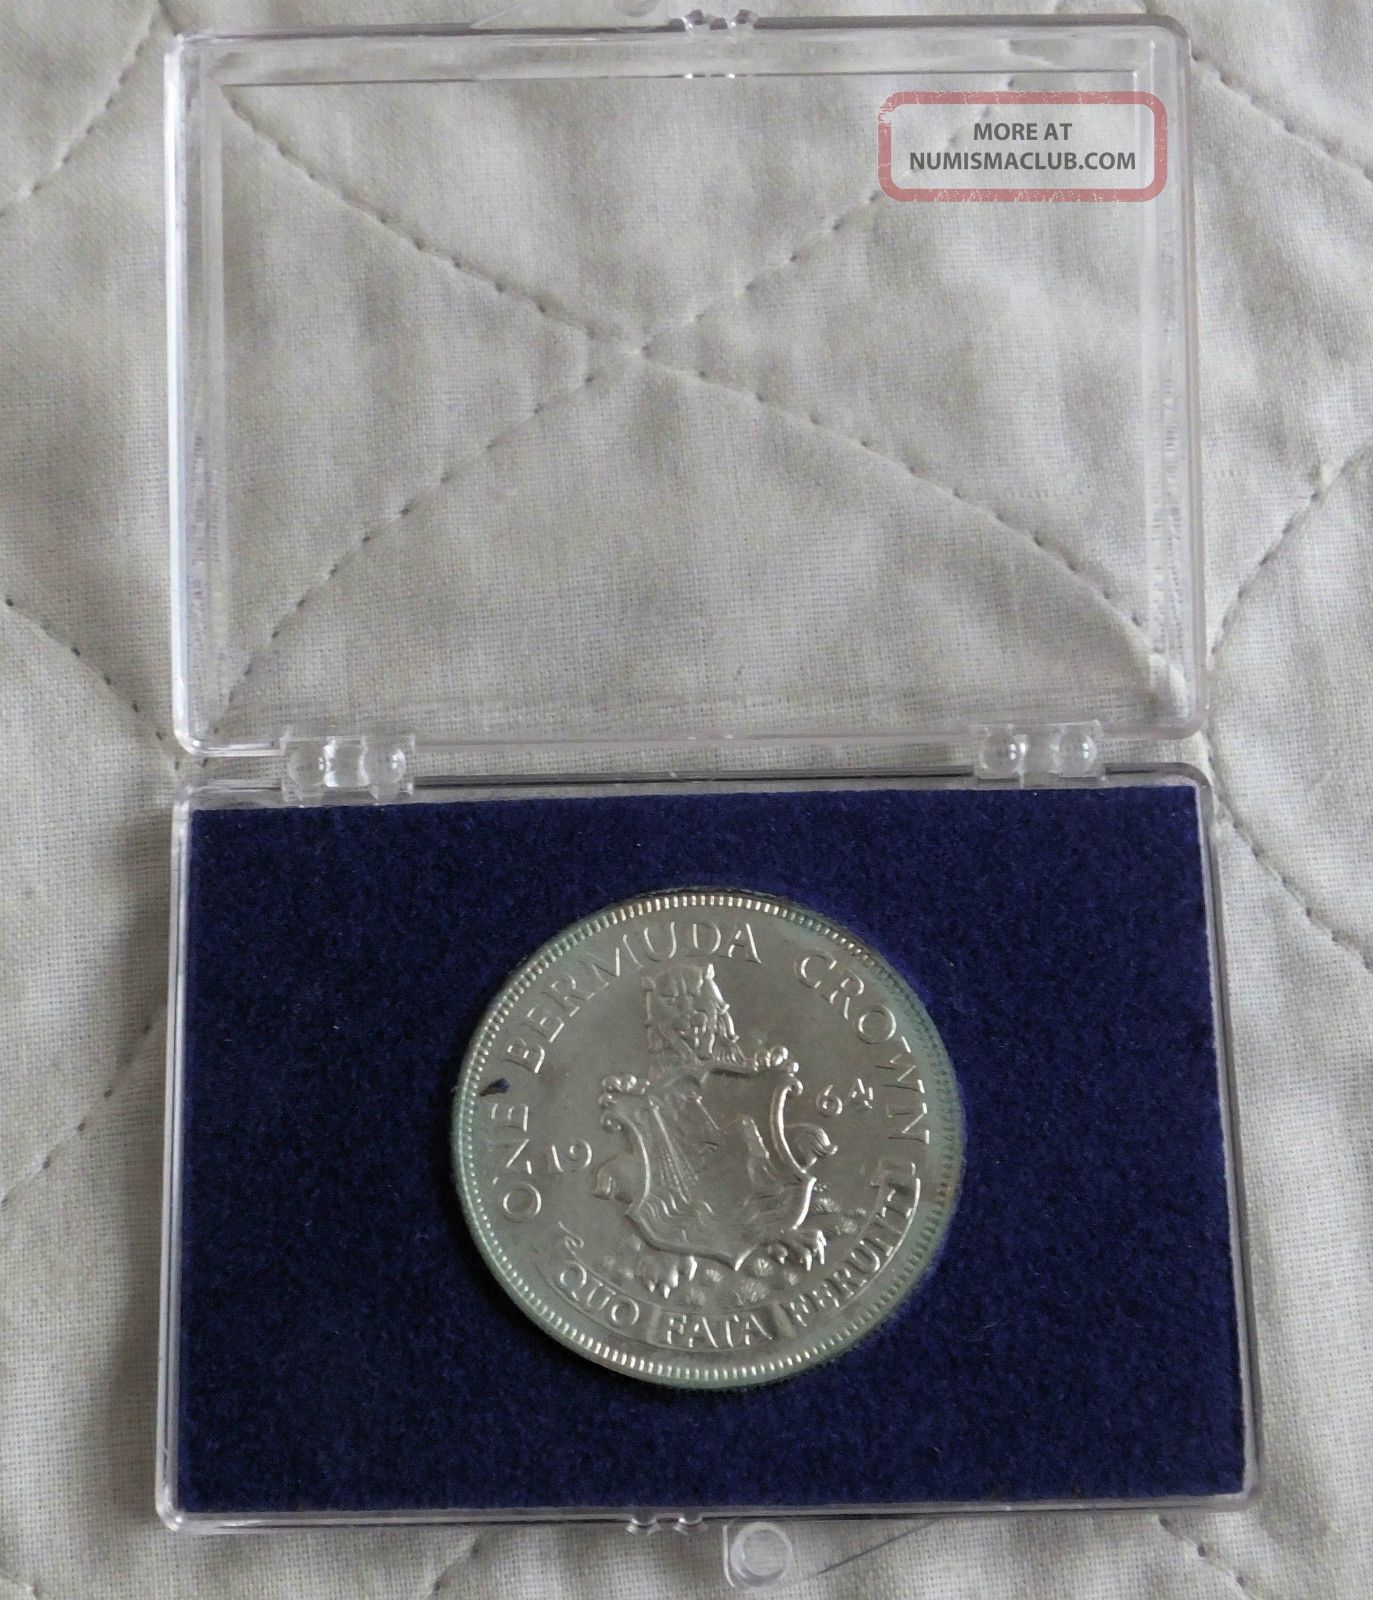 Bermuda 1964 Silver Crown - Cased South America photo